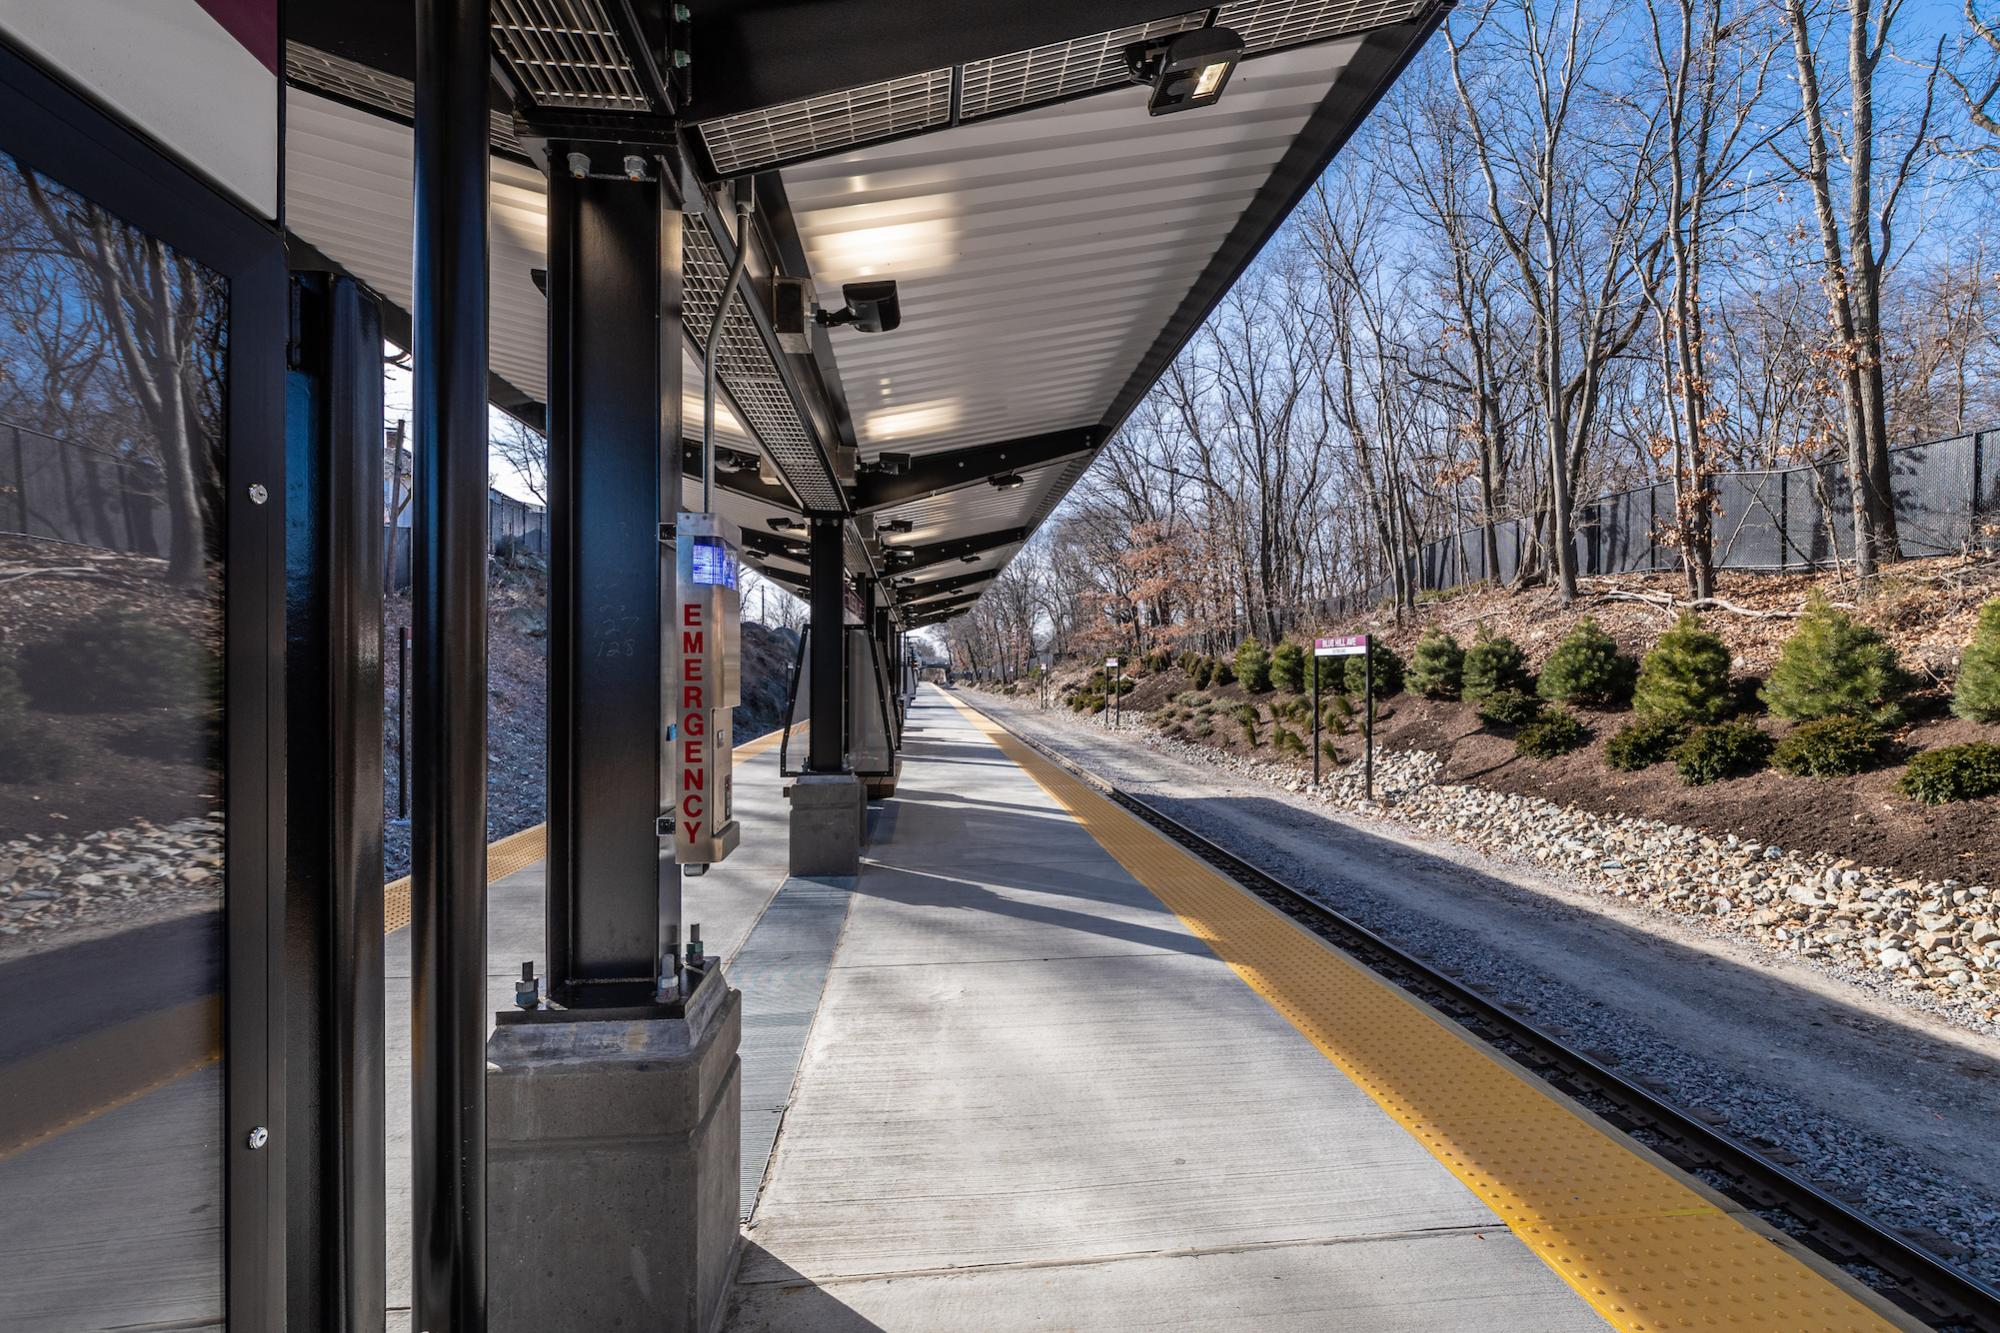 Station platform with canopy (January 2019)